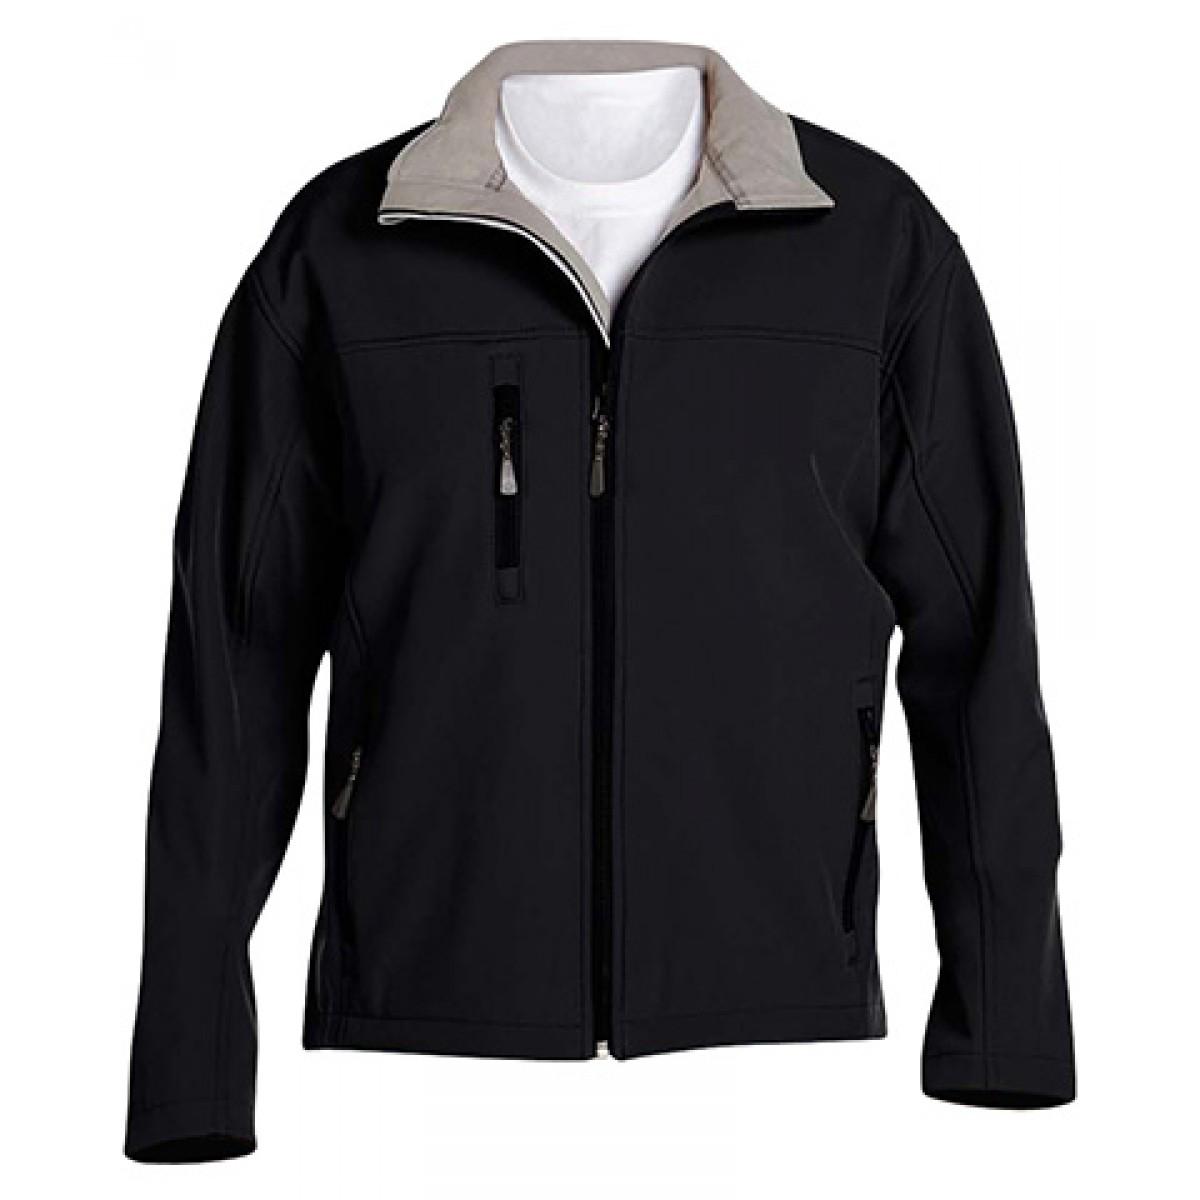 Men's Soft Shell Jacket-Black-3XL